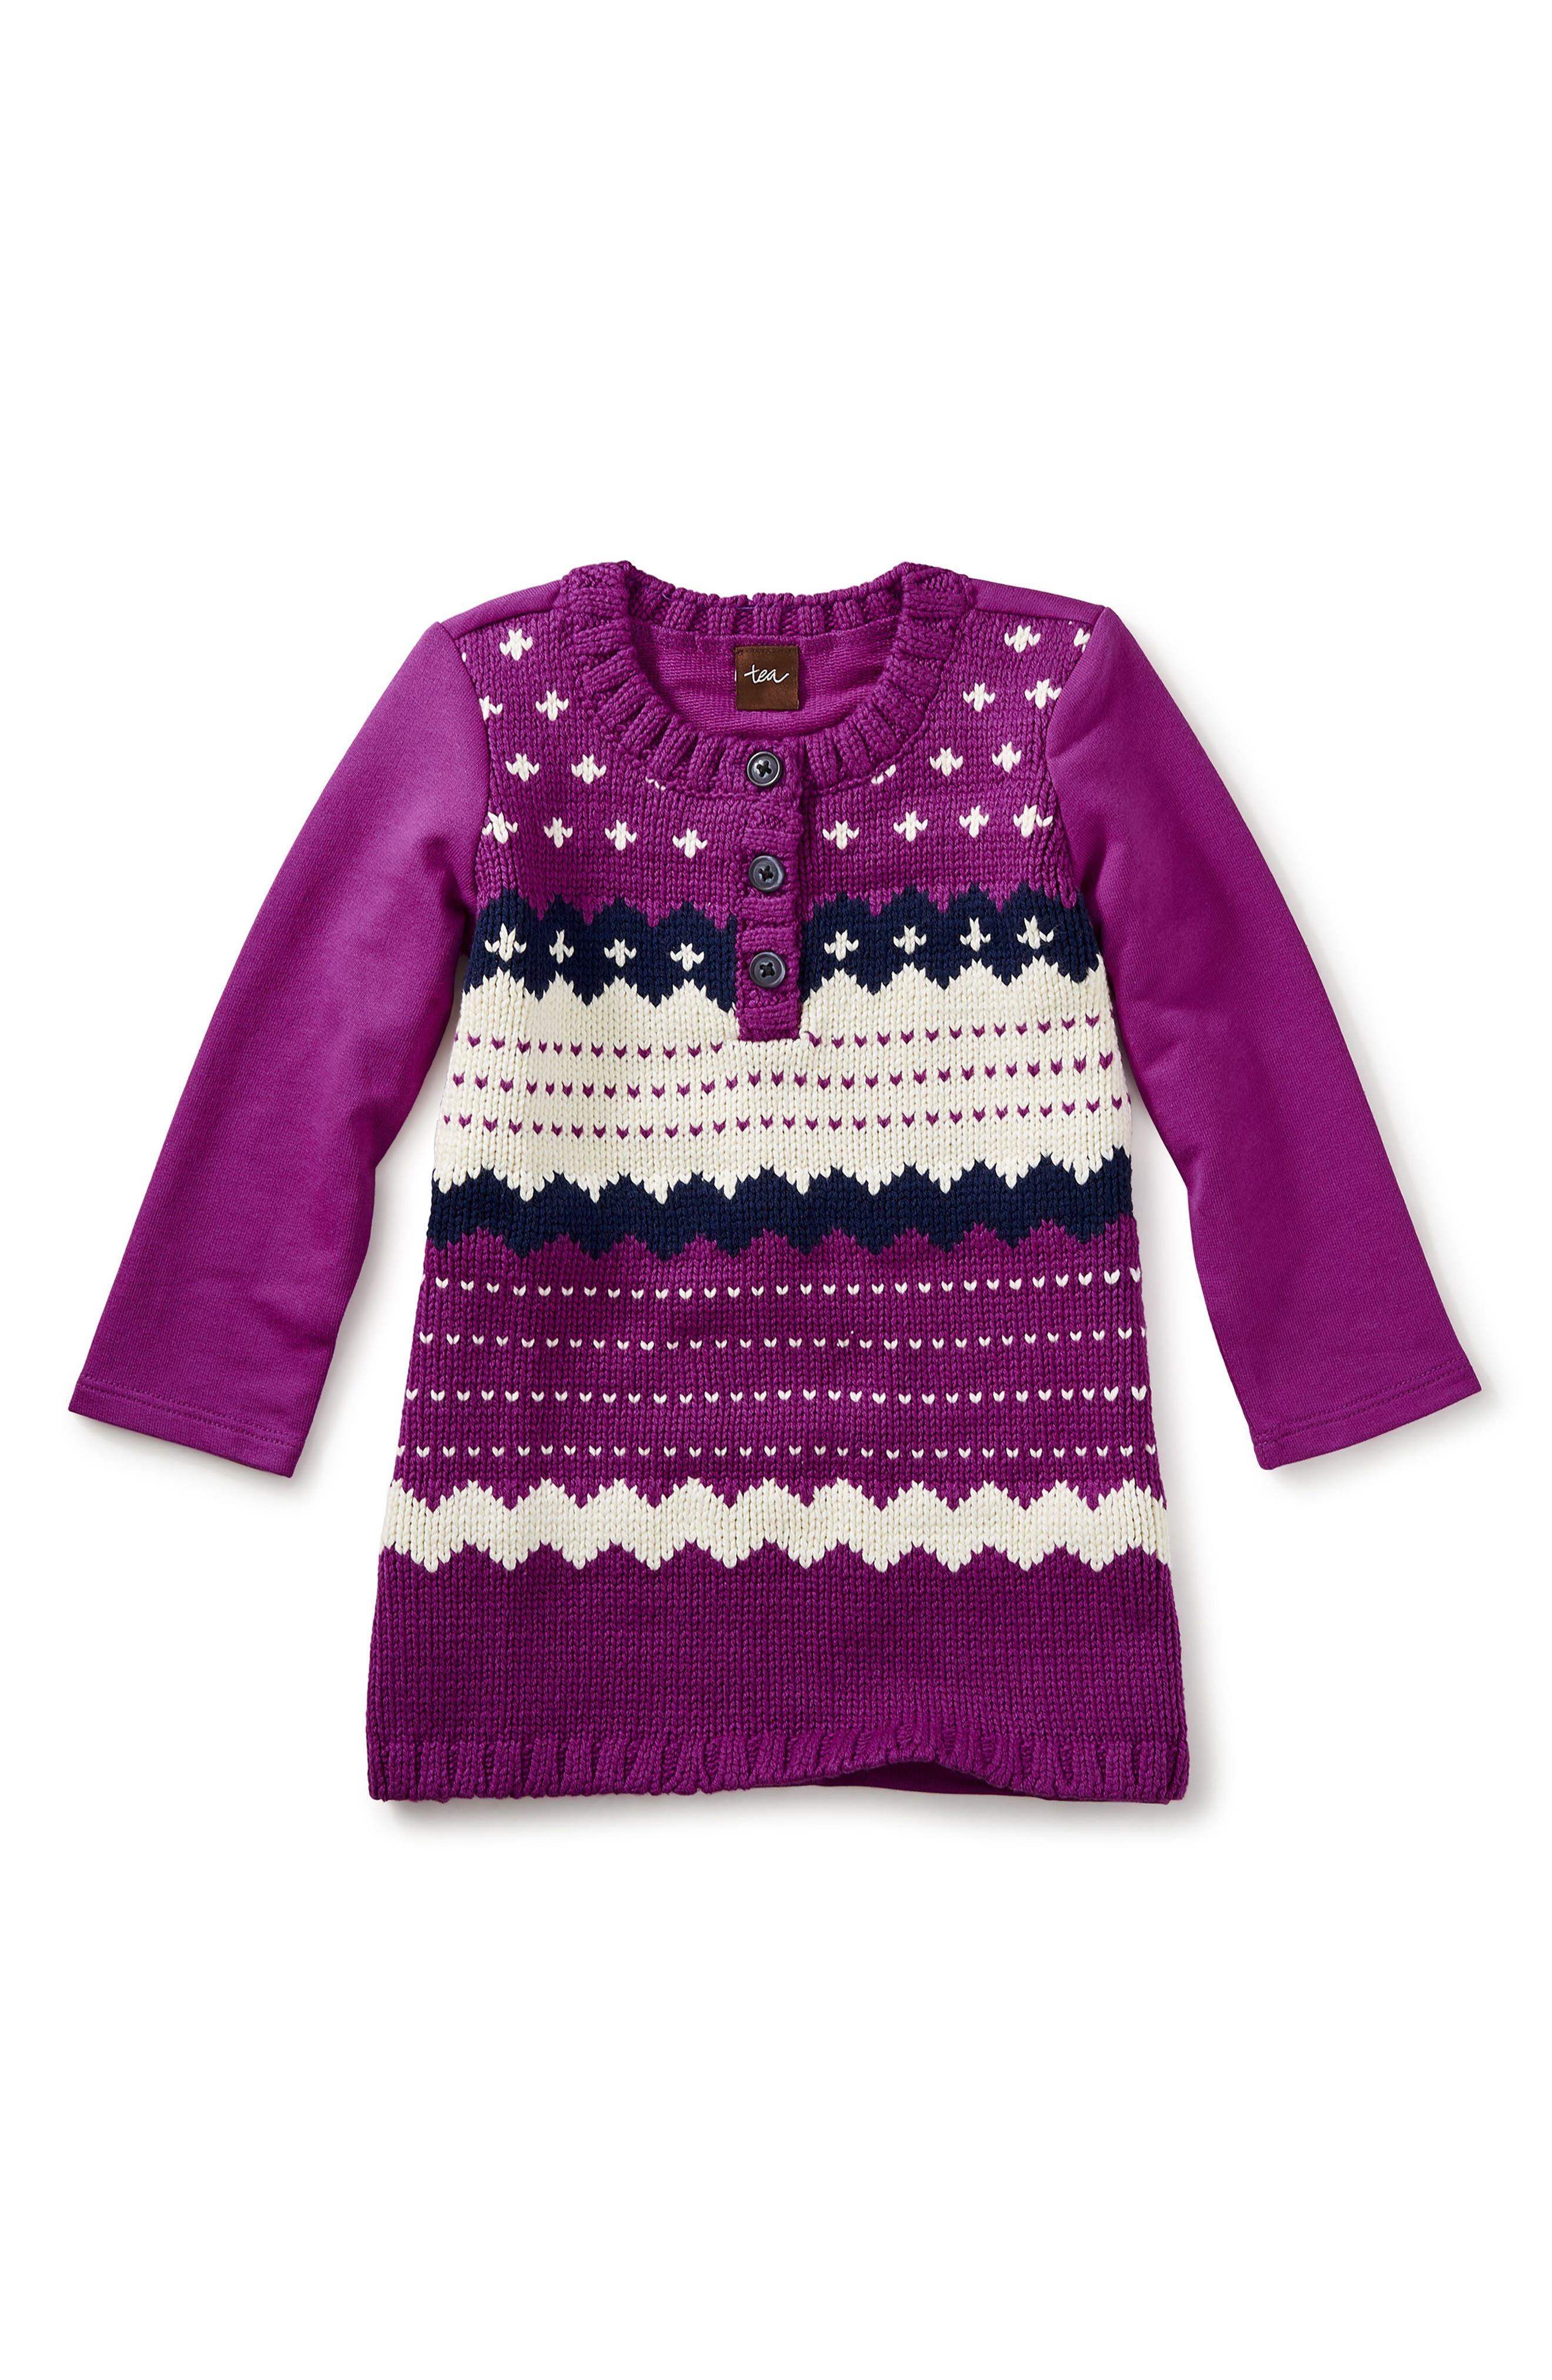 Main Image - Tea Collection Fair Isle Sweater Dress (Baby Girls)